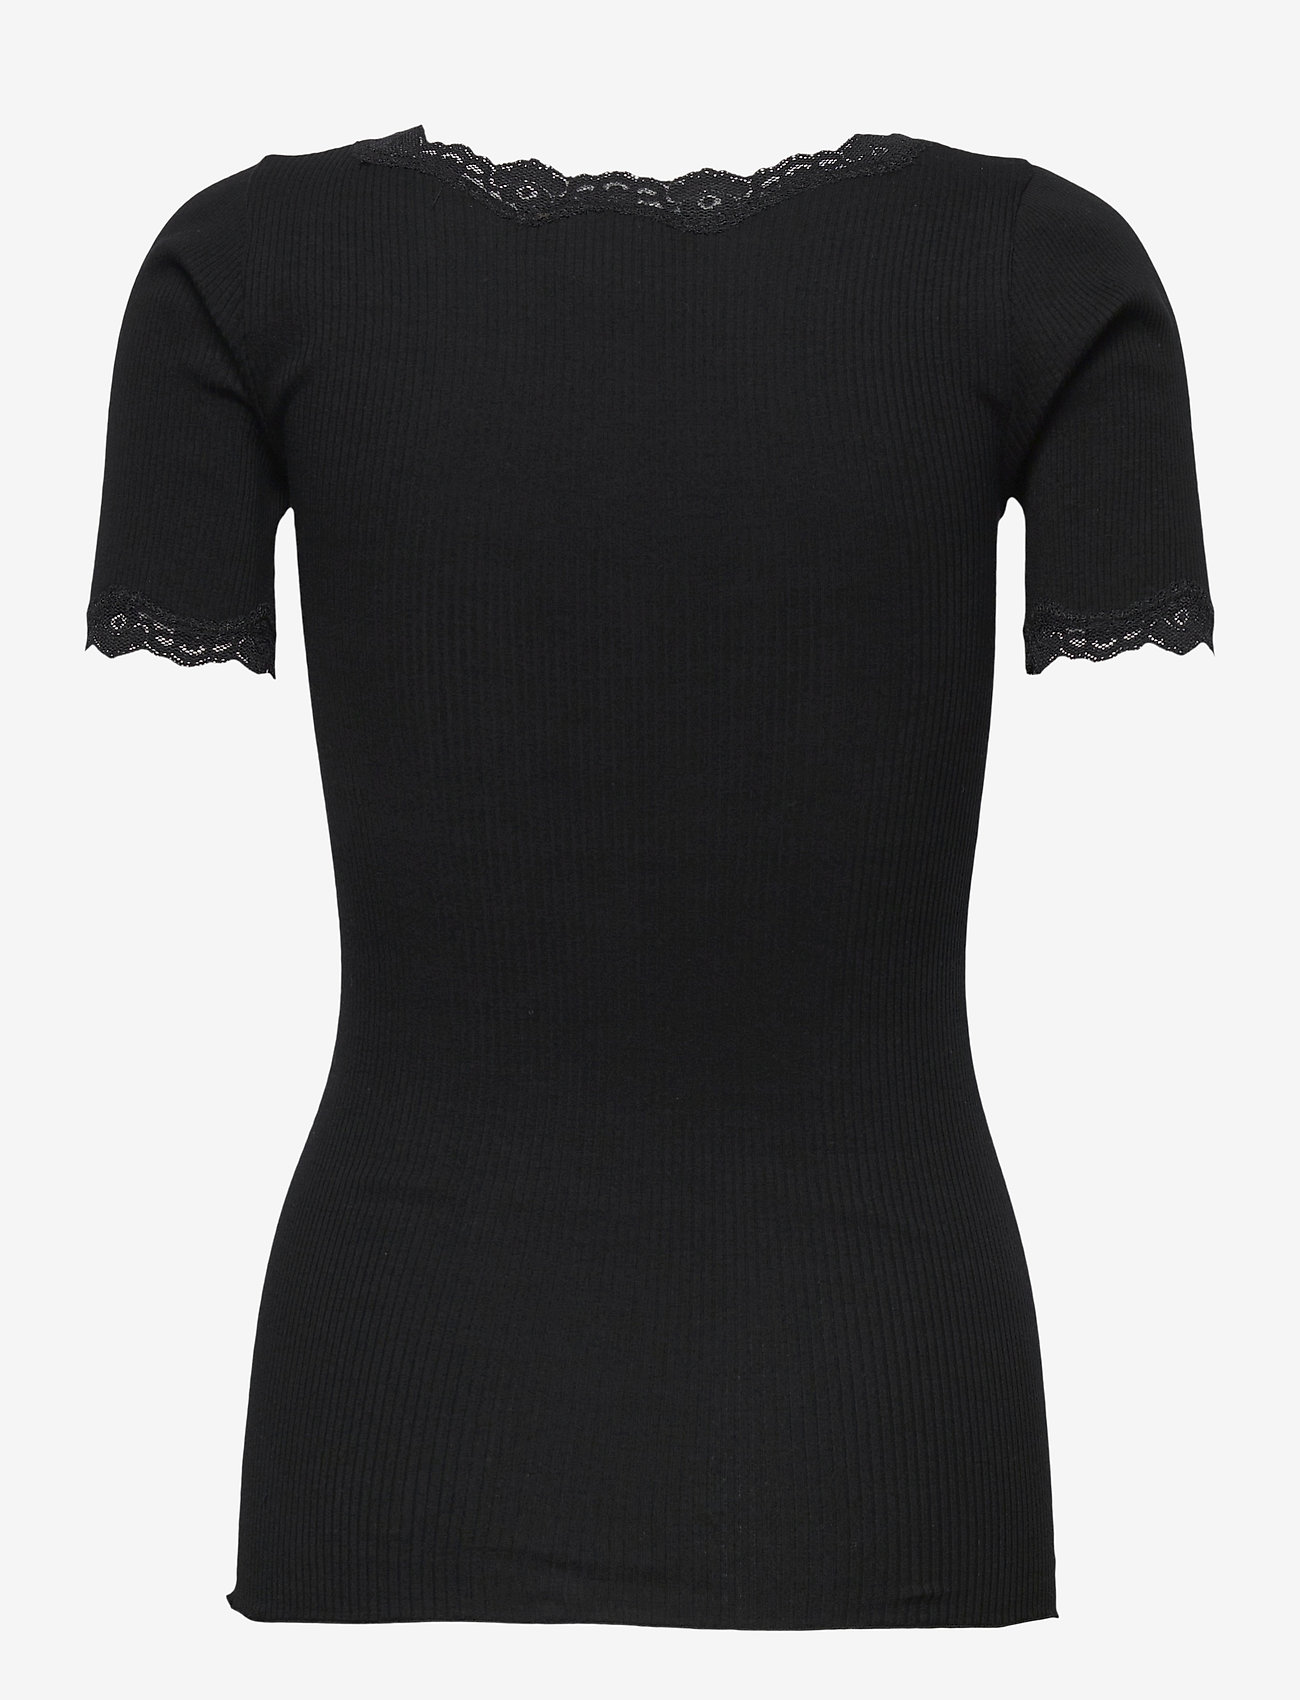 Rosemunde - Organic t-shirt regular ss w/ rev,v - t-shirts - black - 1